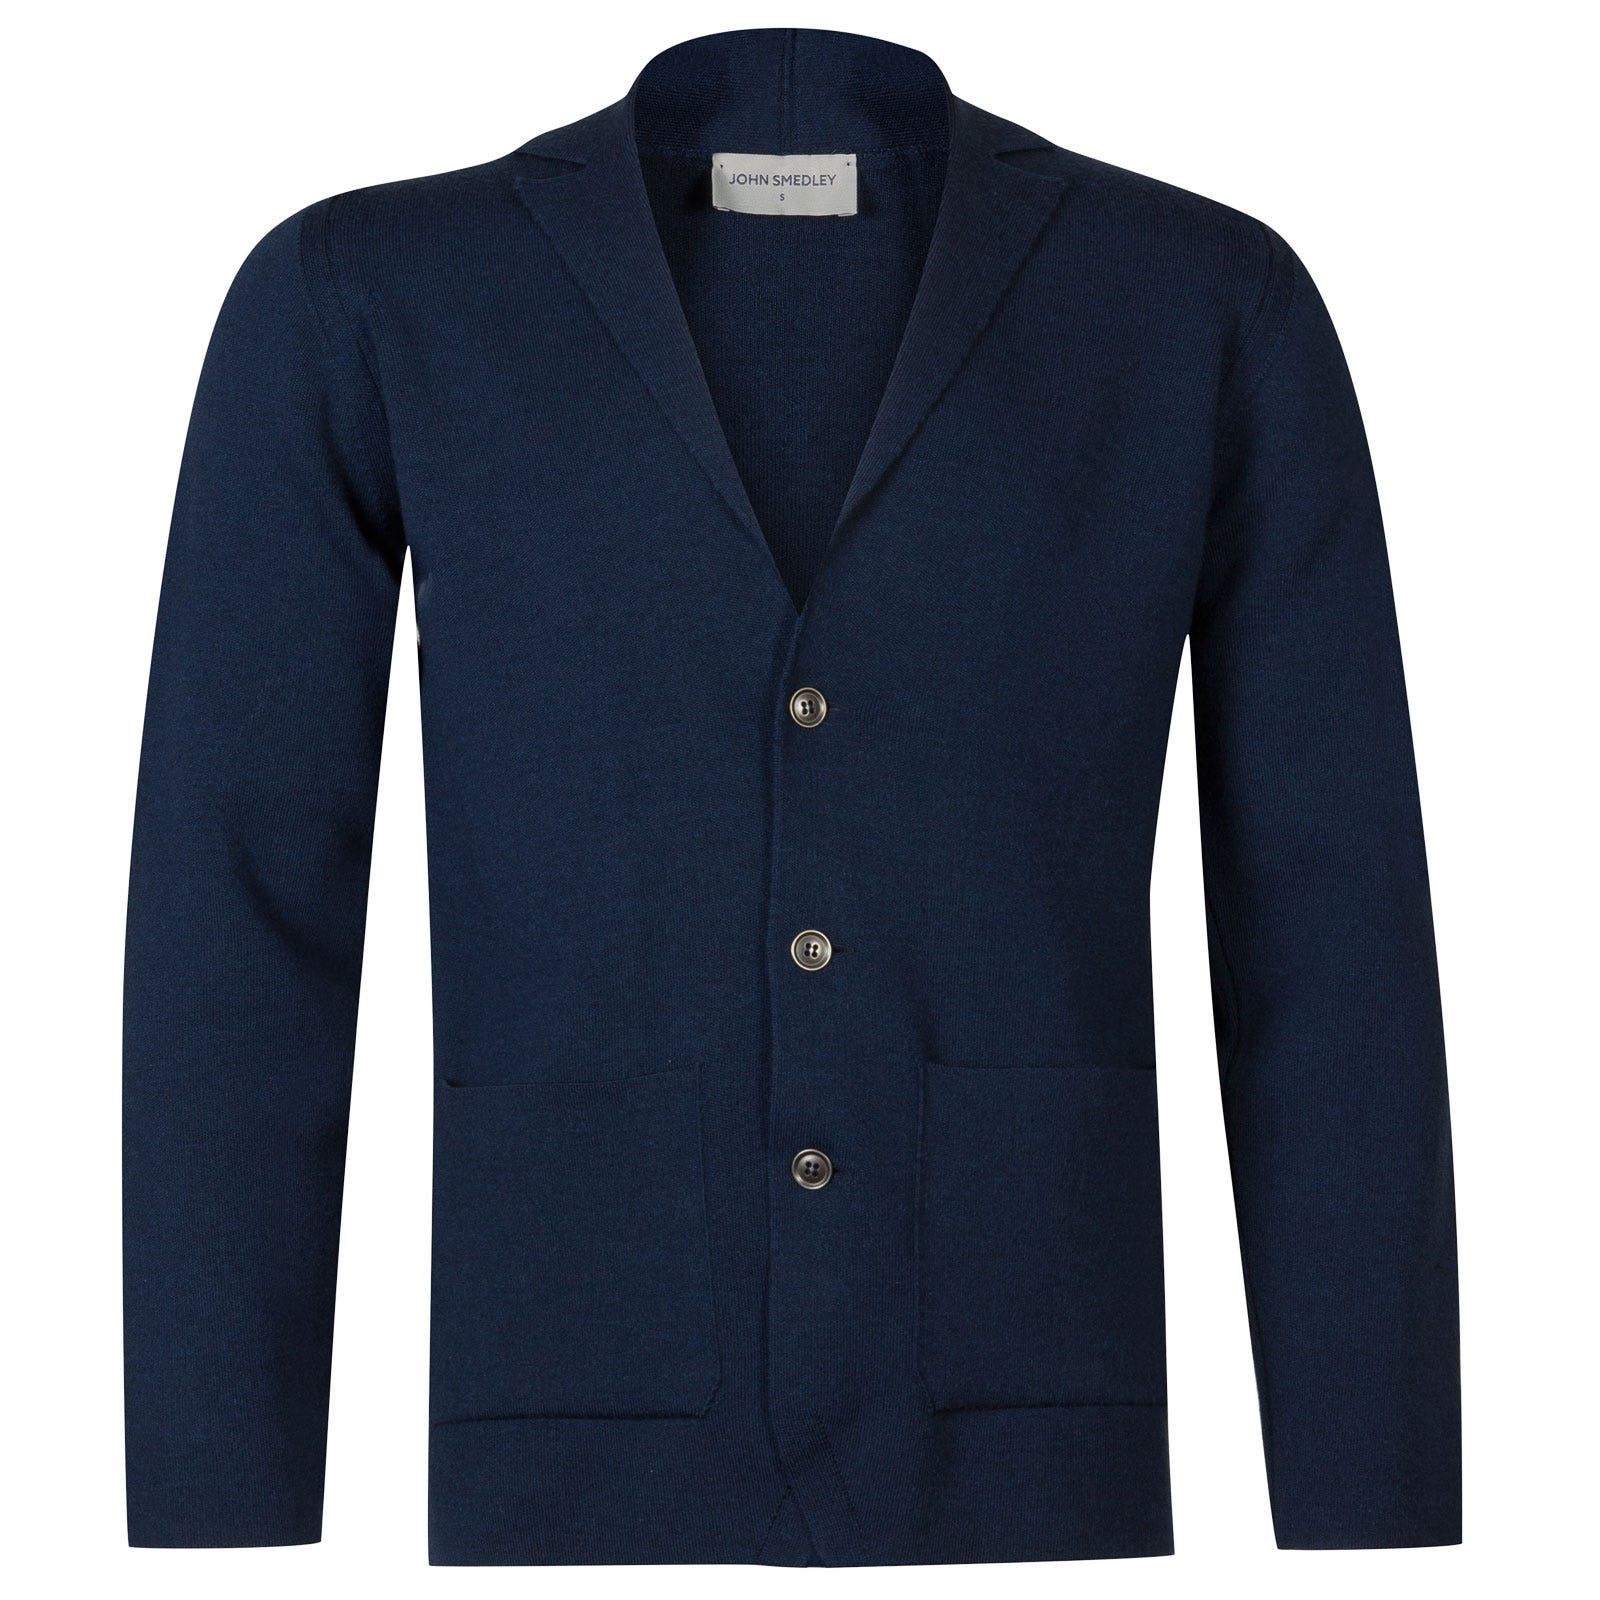 John Smedley Oxland Merino Wool Jacket in Indigo-M